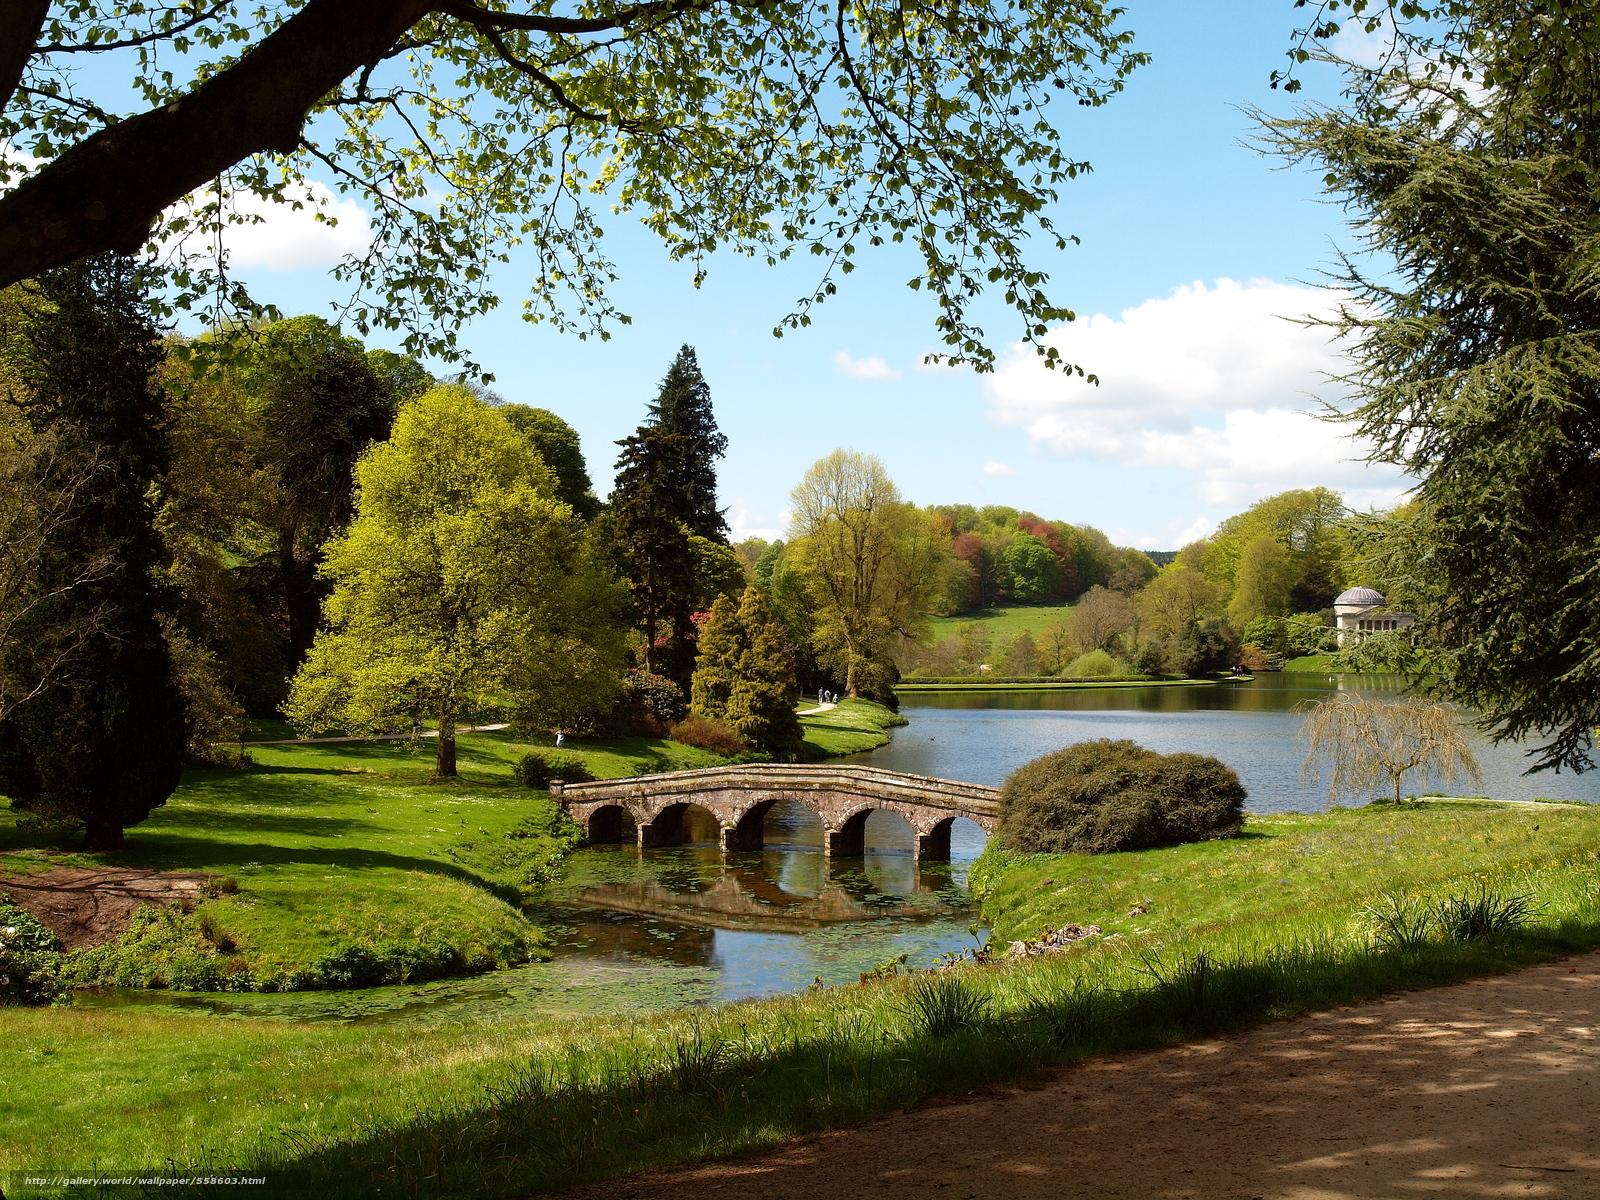 Download Wallpaper Stourhead Garden Wiltshire England